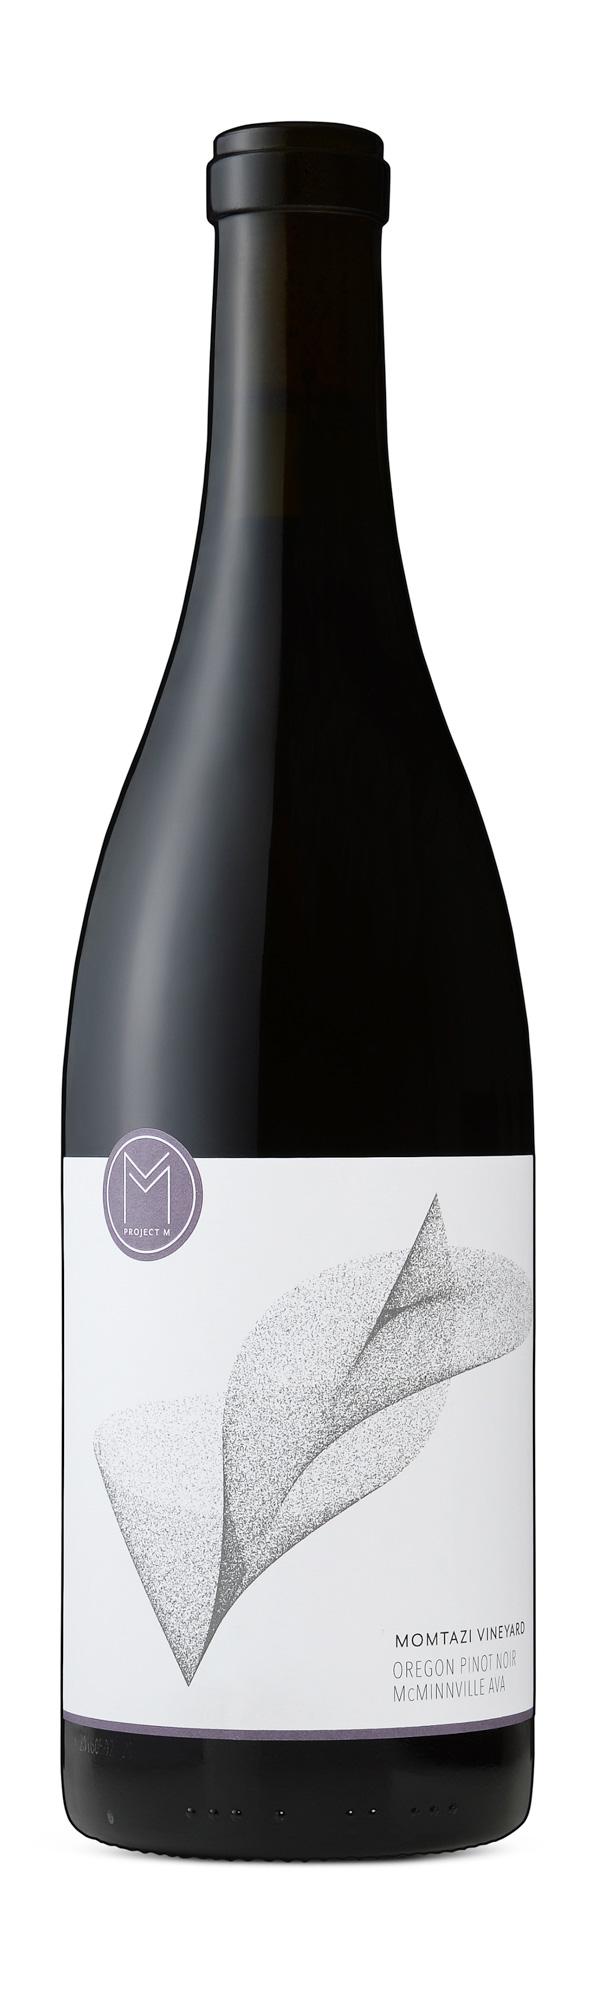 MOMTAZI VINEYARD 2017 Pinot Noir  COMING SOON